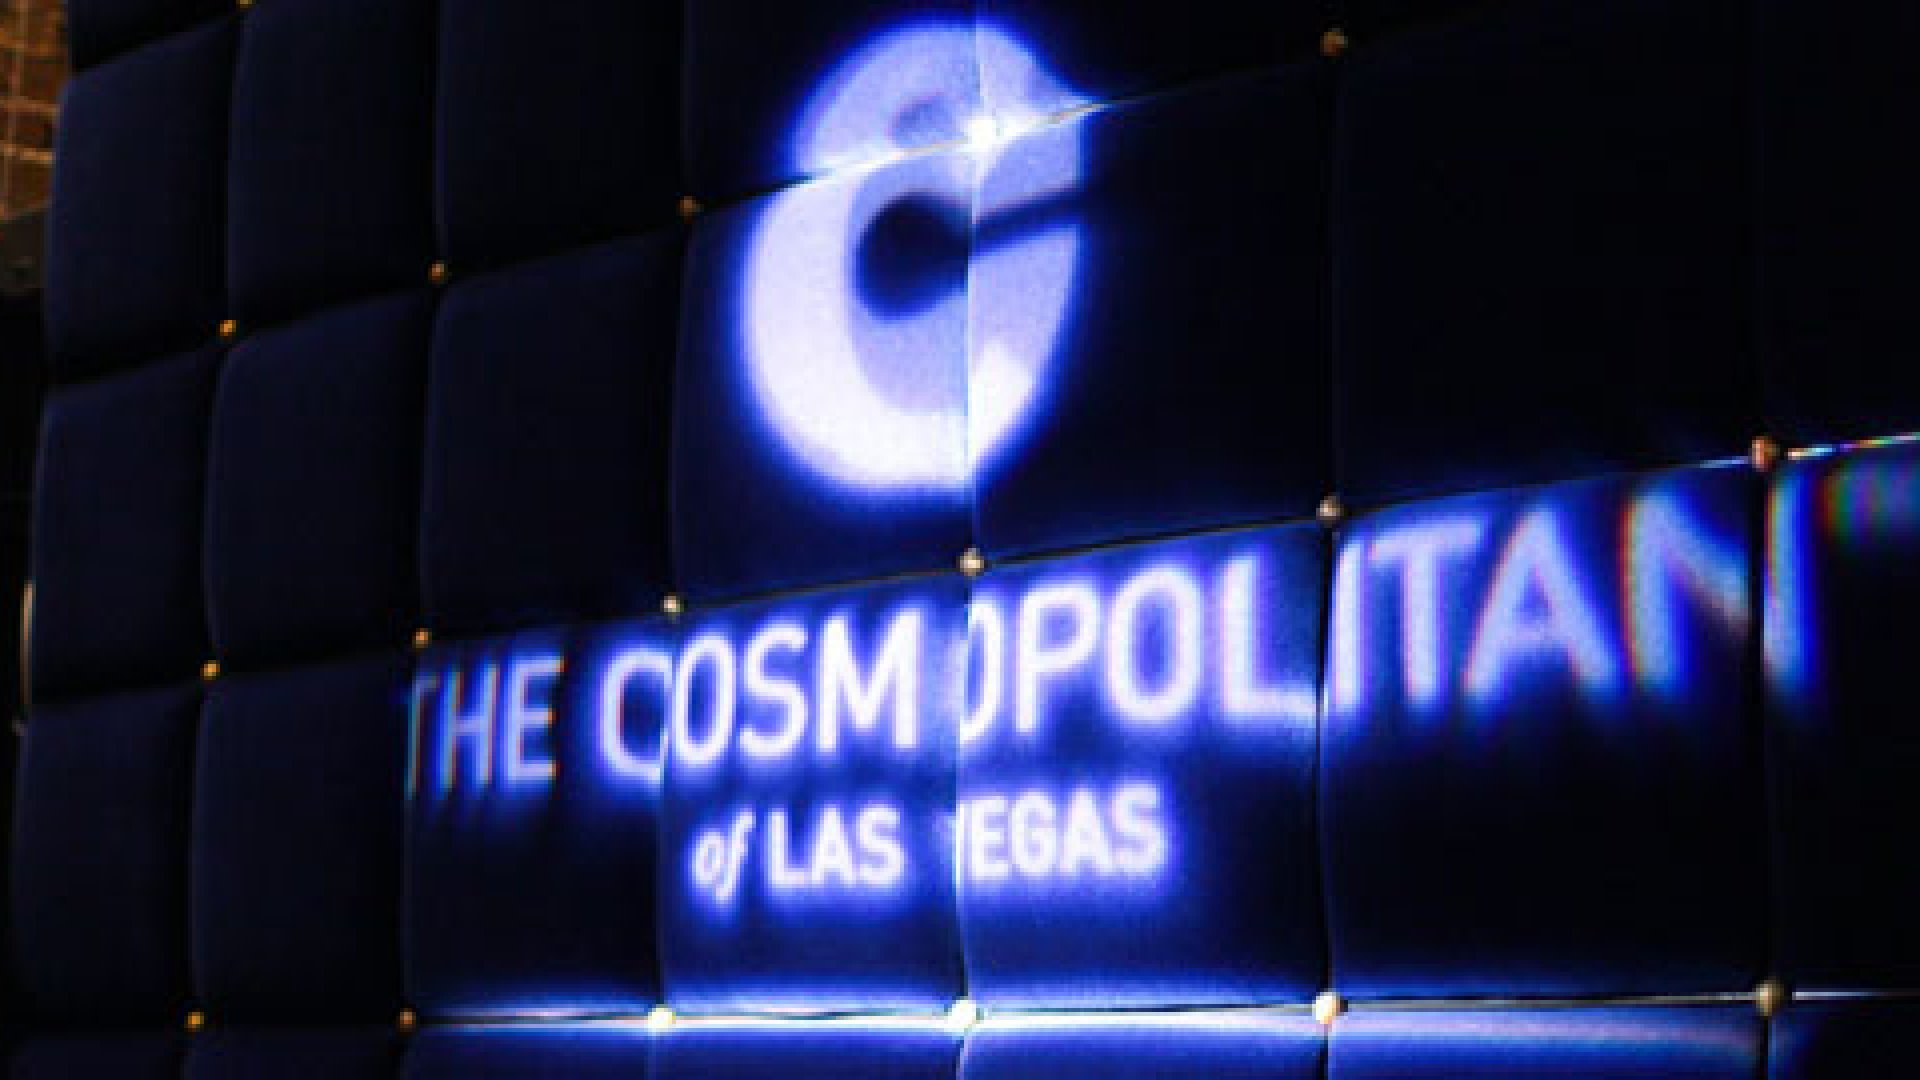 Most Socially Savvy Hotel: The Cosmopolitan, Las Vegas